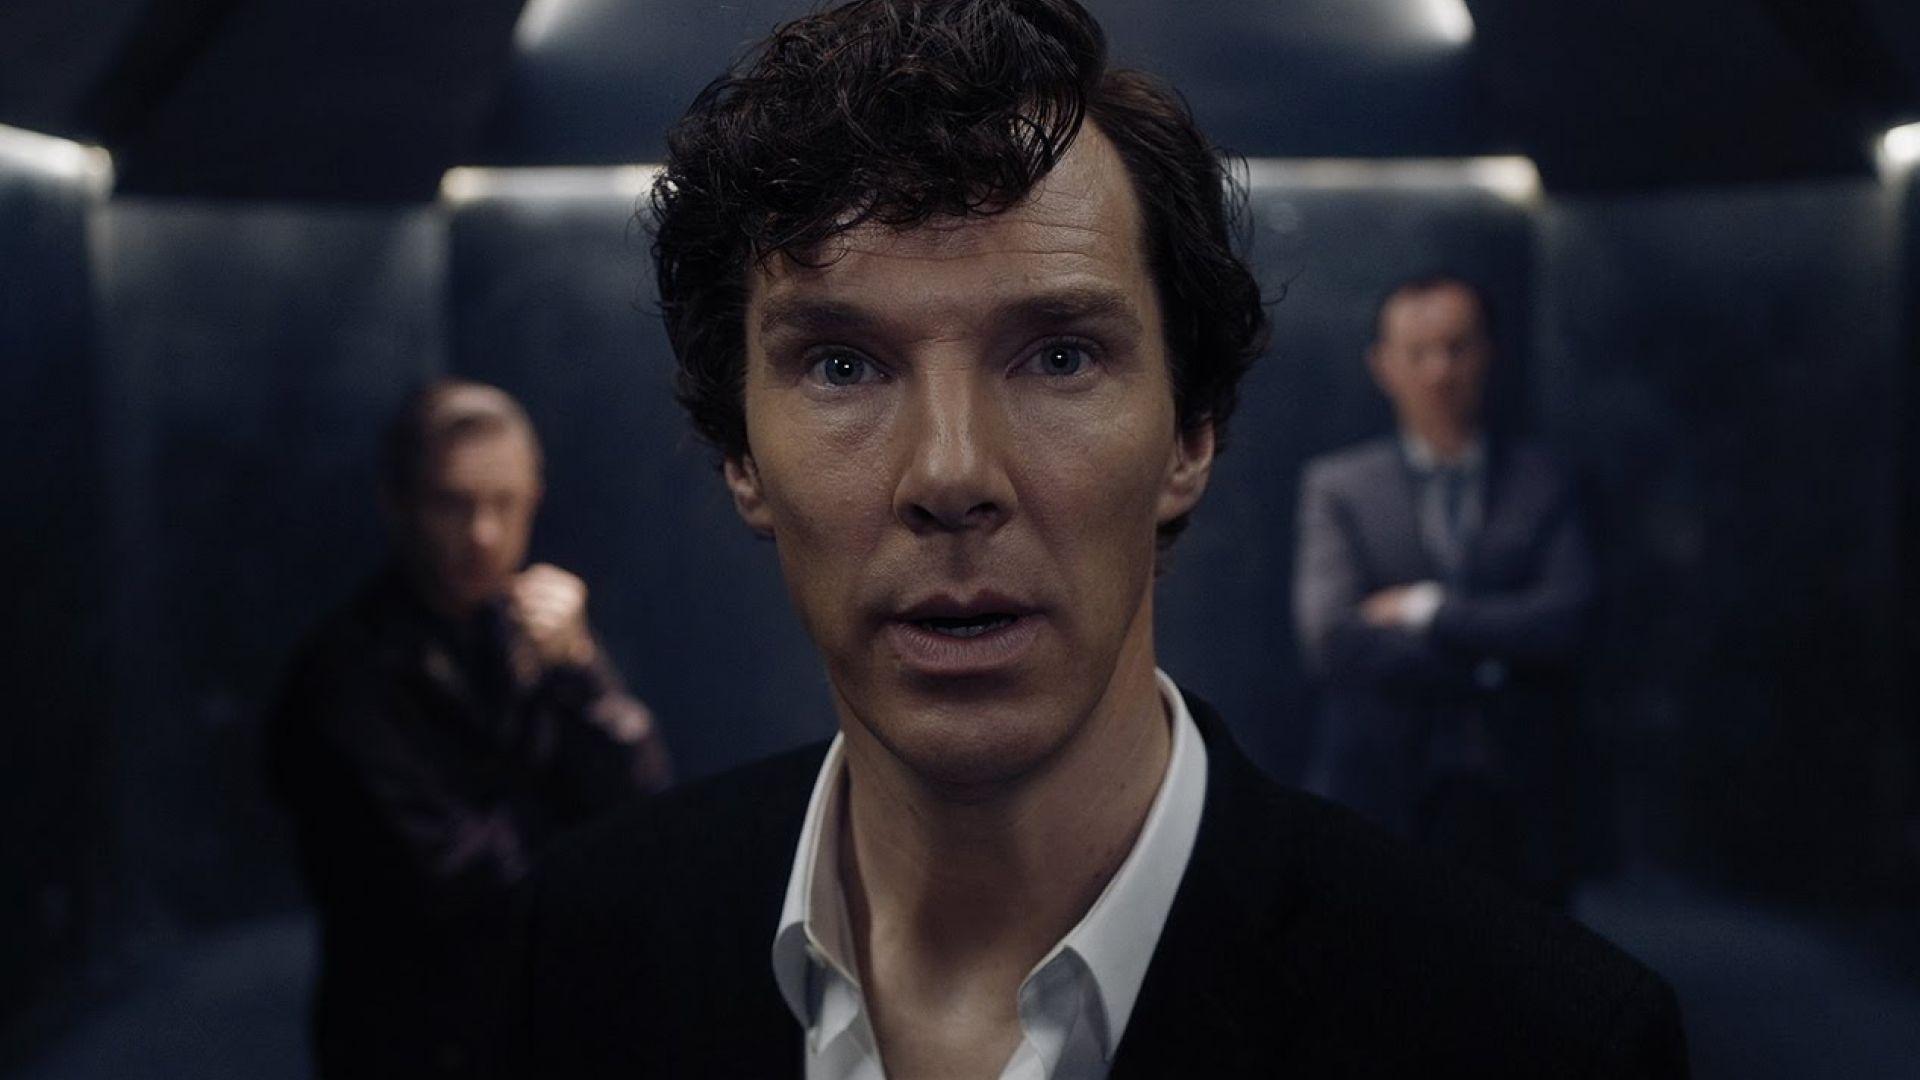 A new trailer has landed for season 4 of 'Sherlock'